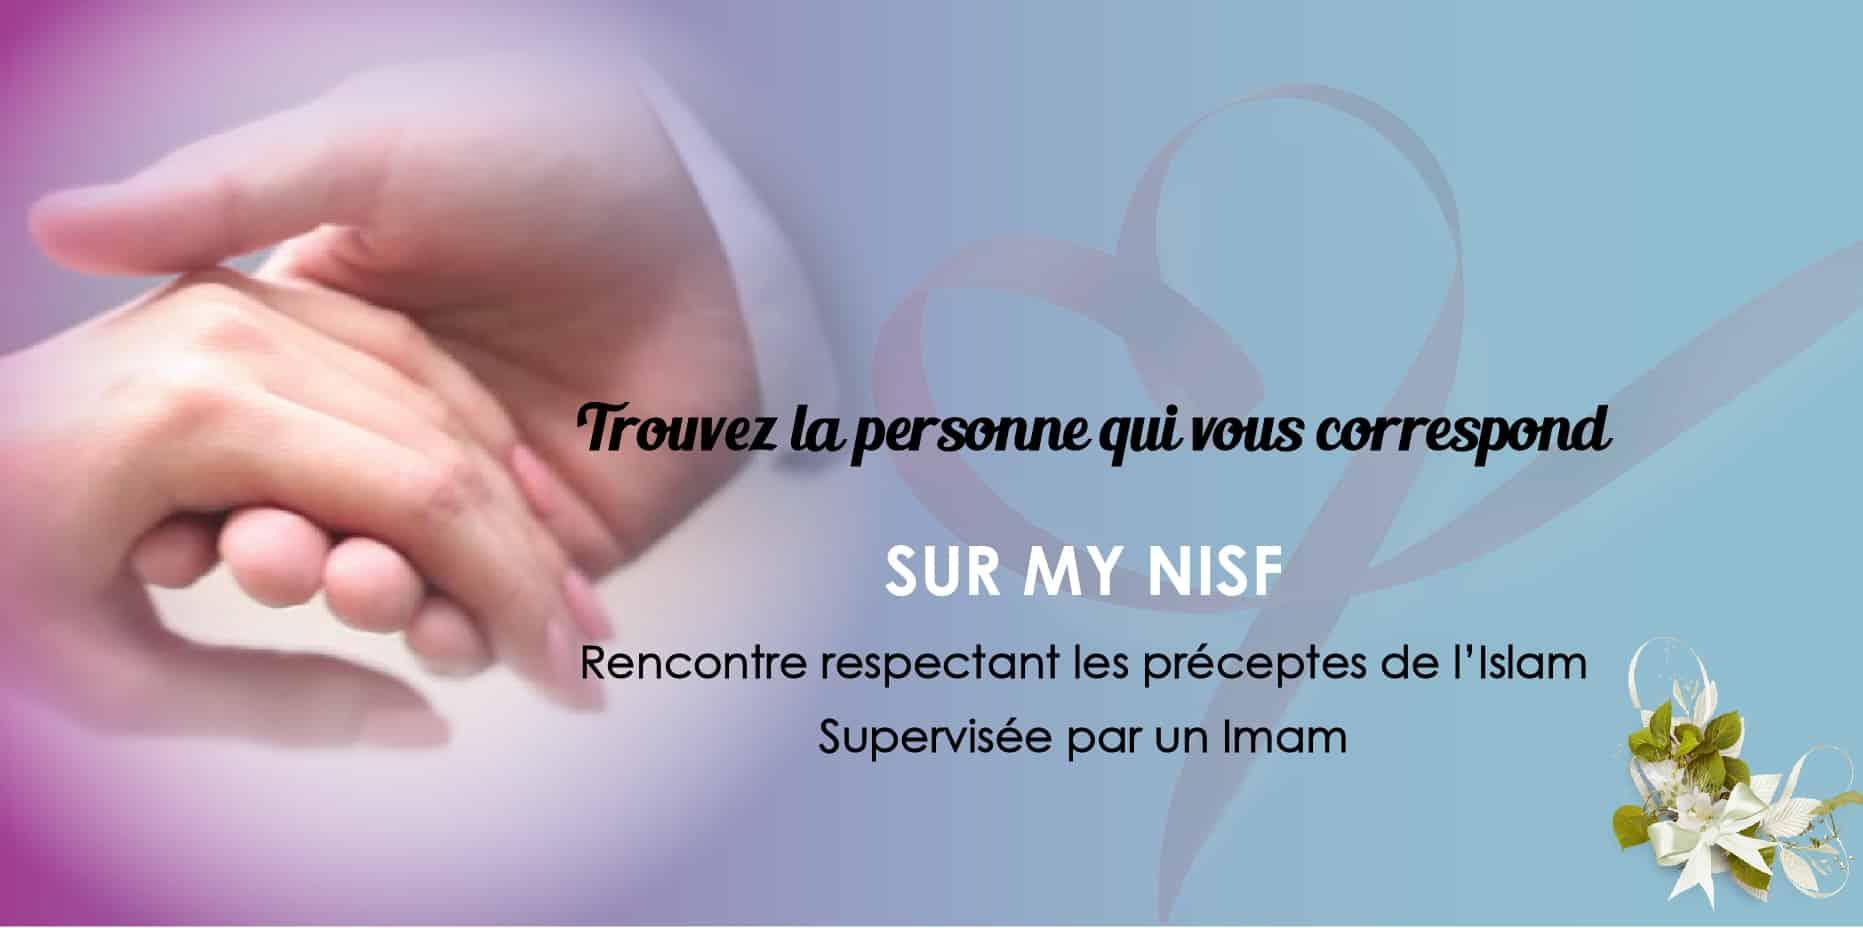 My-nisf-mariage-islam.jpg